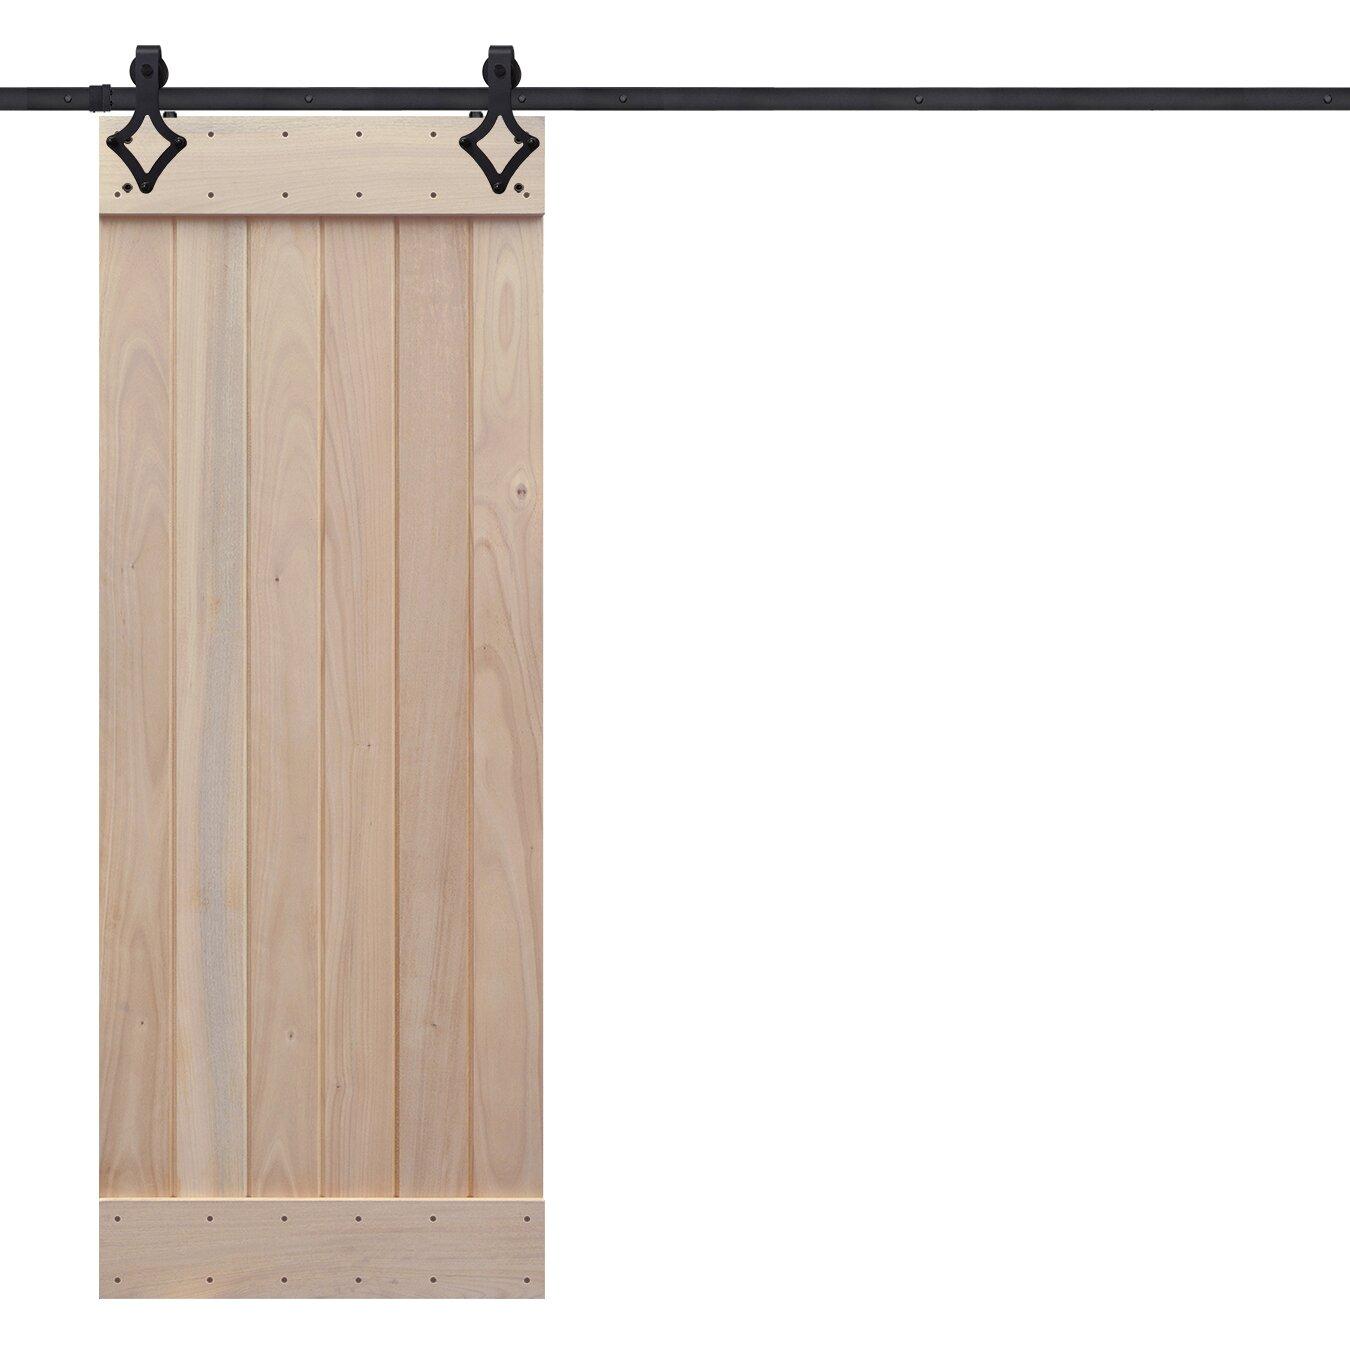 Barndoorz Rustic Knotty Alder Plank Wood Interior Barn Doors